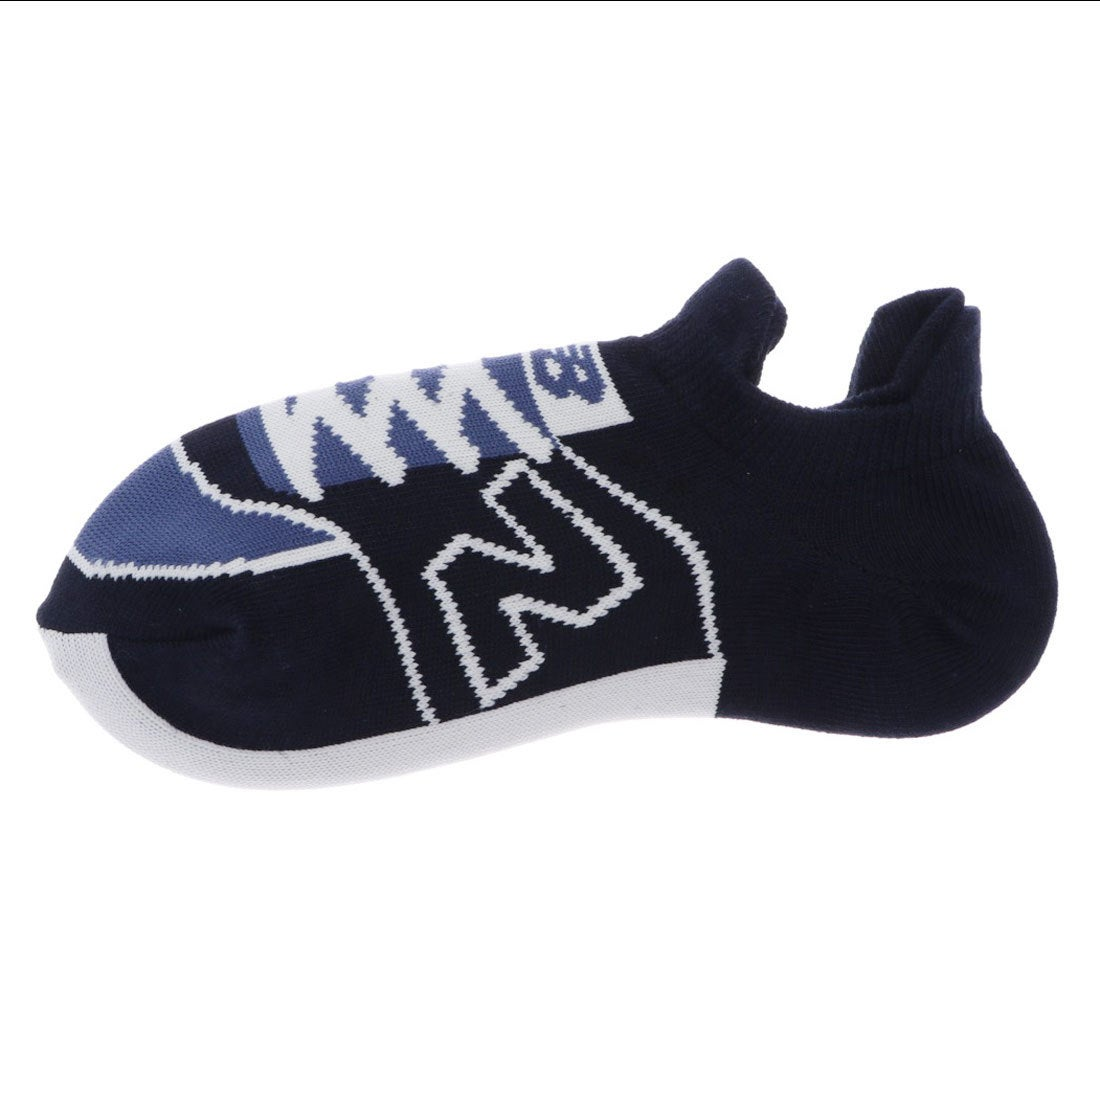 e9c435a1205dd8 new balance ニューバランス NEW BALANCE ソックス JASL8222 JASL8222 靴下 -レディースファッション通販  ロコンドガールズコレクション (LOCONDO GIRL'S COLLECTION)